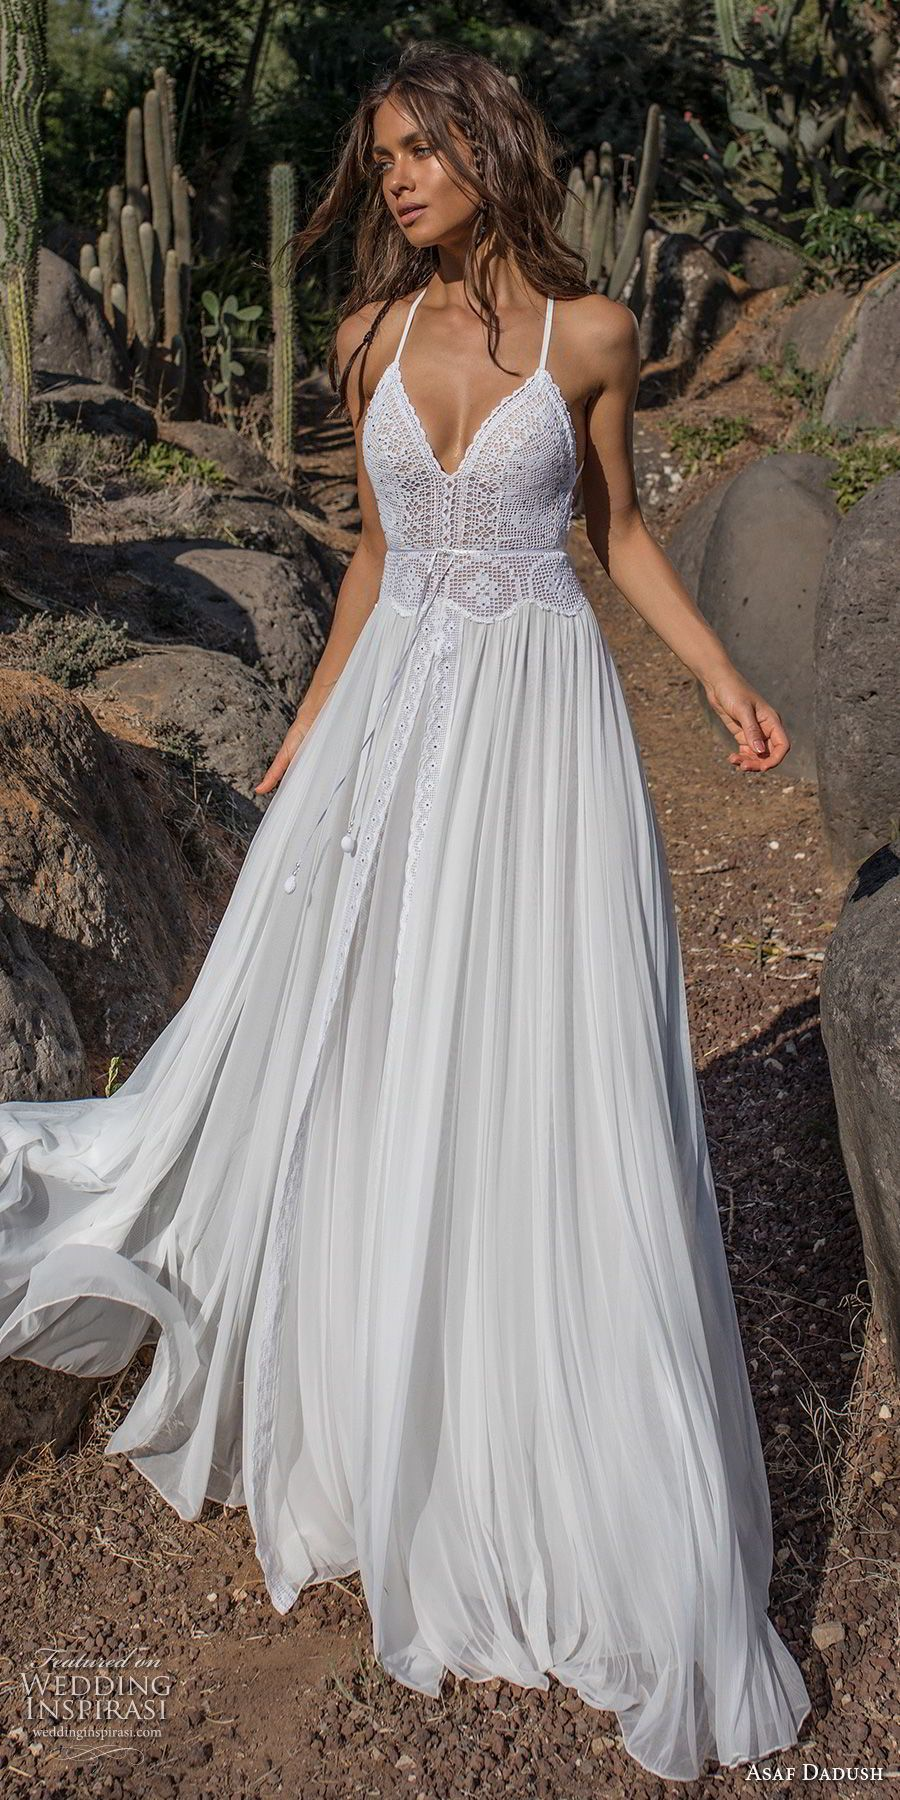 One side strap wedding dress  Asaf Dadush  Wedding Dresses  wedding dress  Pinterest